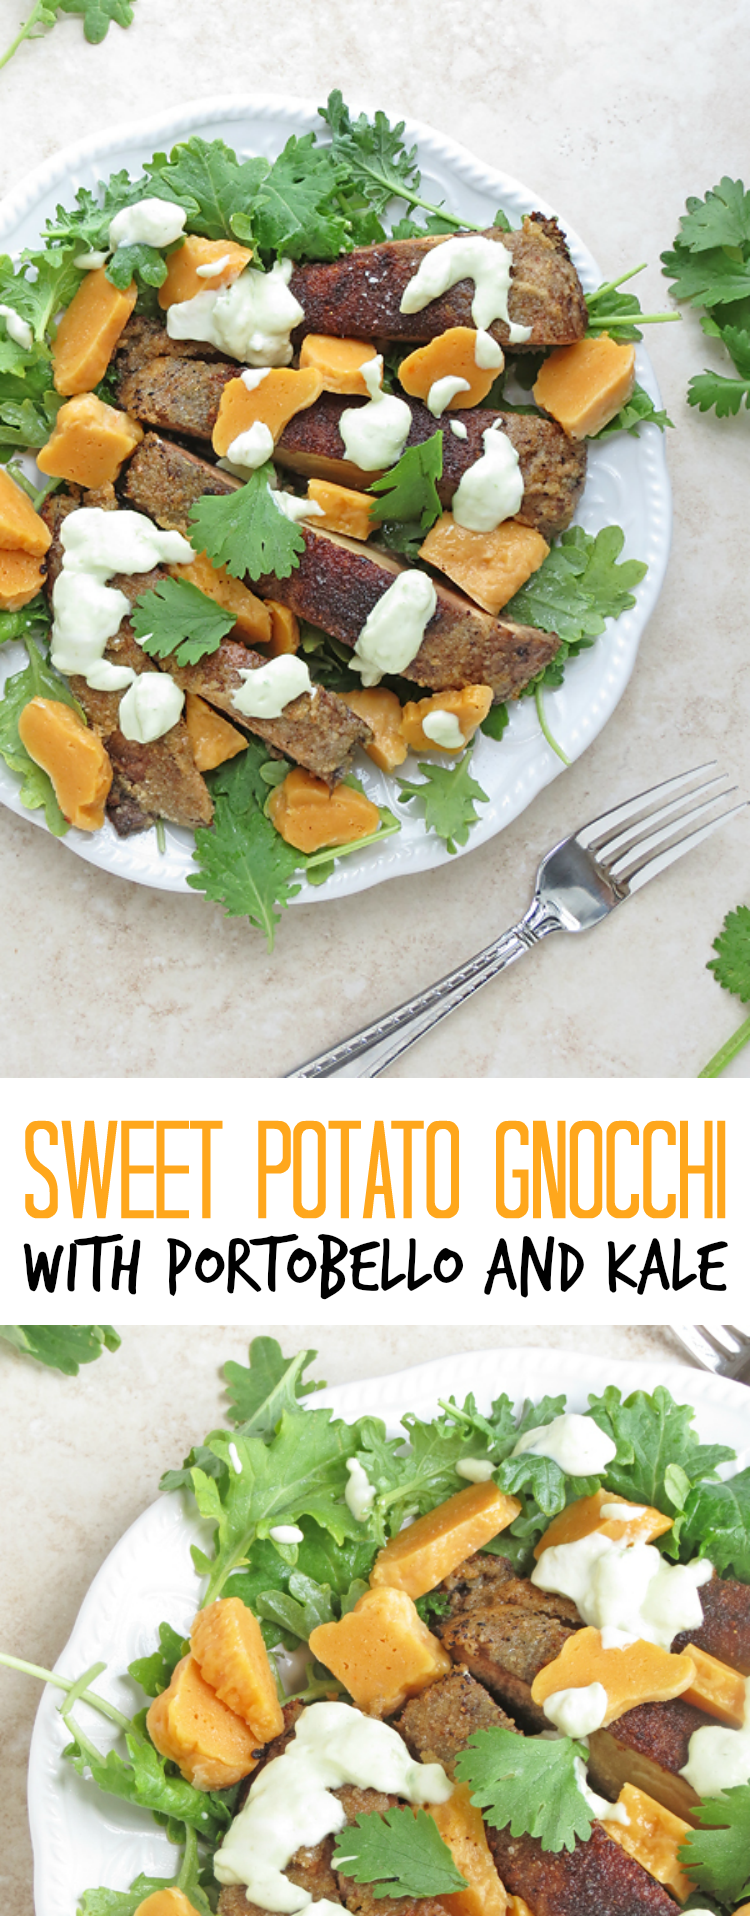 potato gnocchi drizzle with avocado aioli 3 1 http www ohmy creative ...